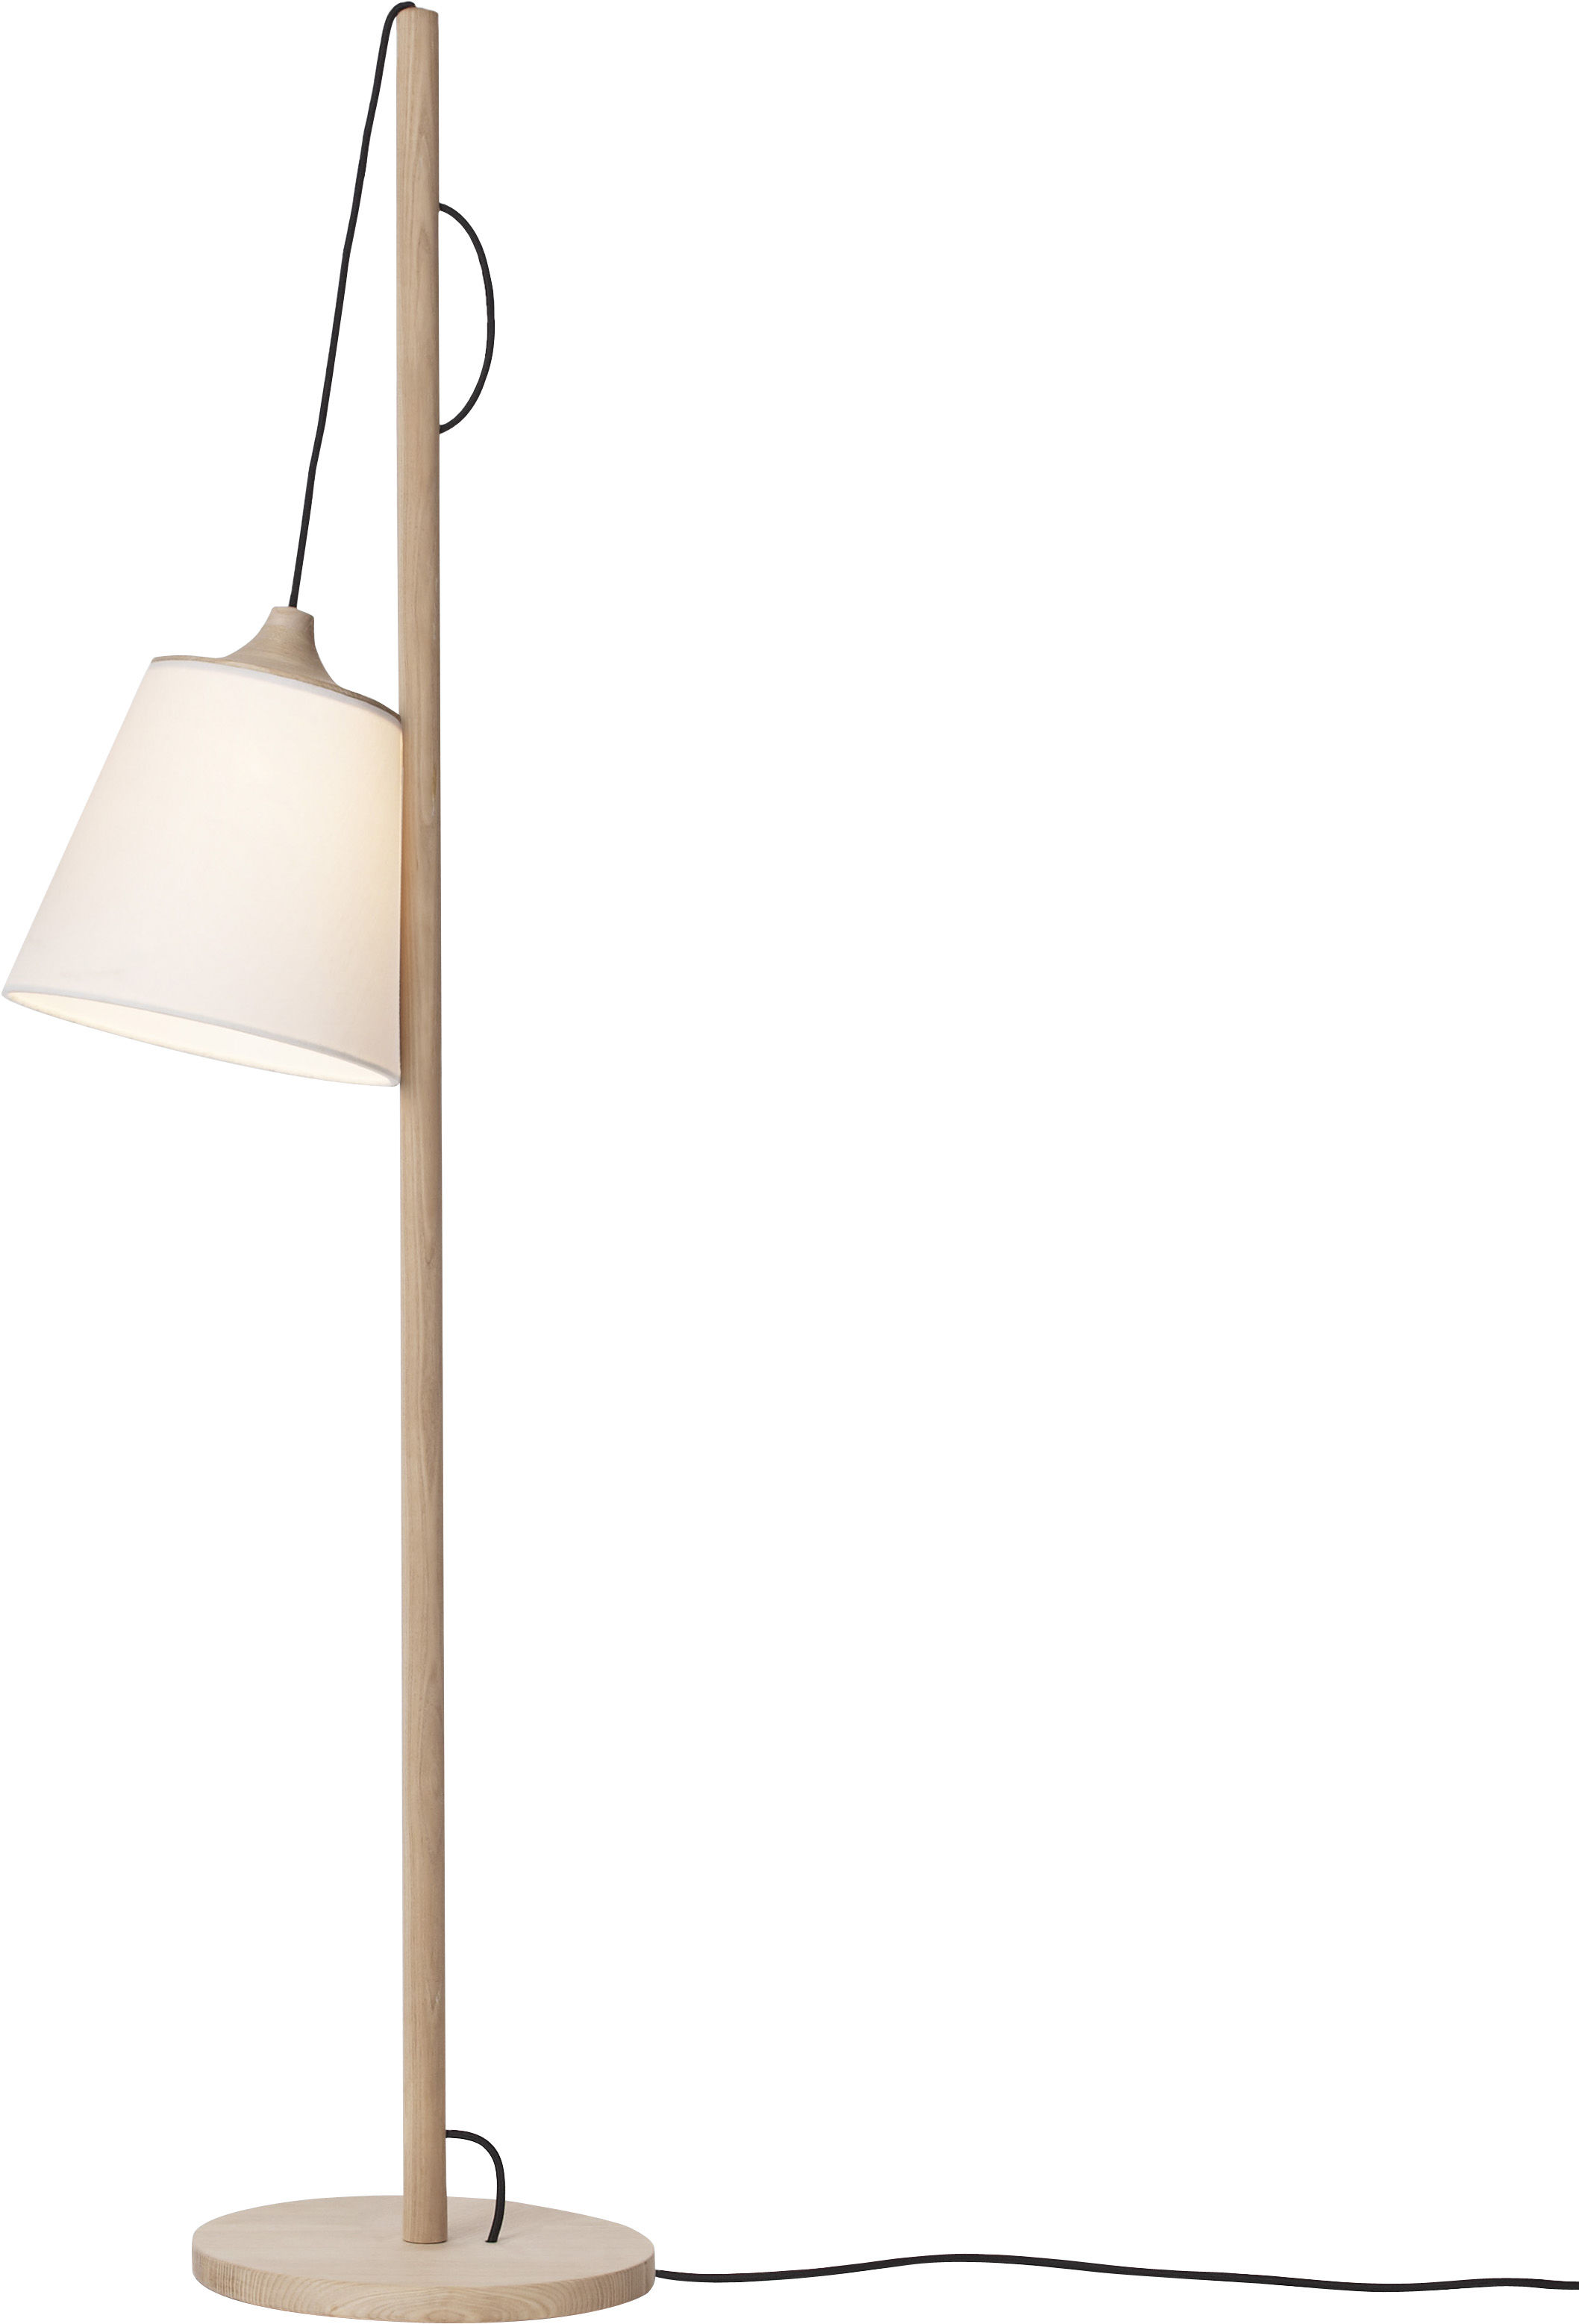 lampadaire pull lamp bois clair abat jour blanc muuto. Black Bedroom Furniture Sets. Home Design Ideas